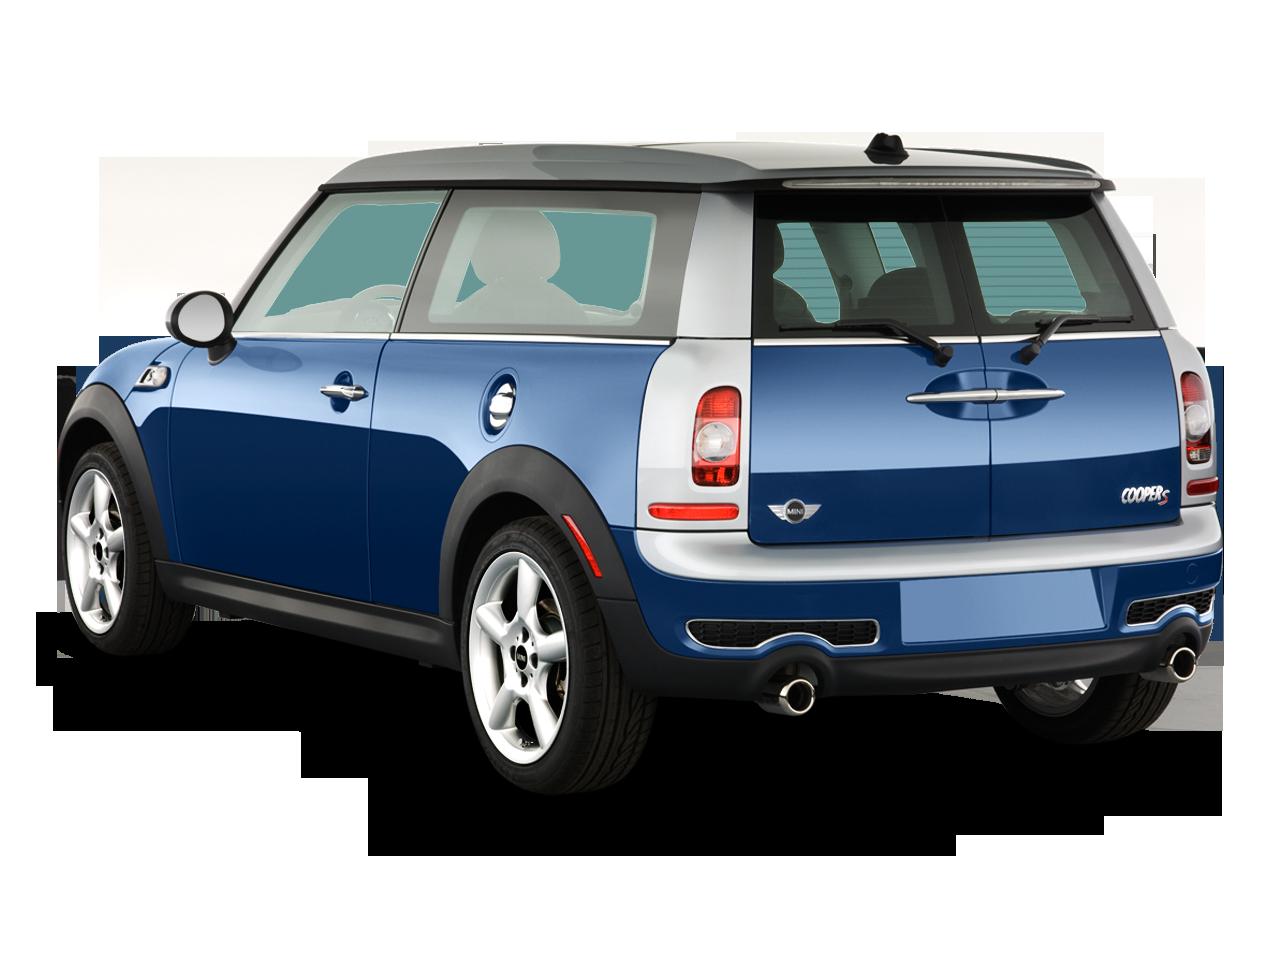 2009 mini cooper s clubman mini compact hatchback review automobile magazine. Black Bedroom Furniture Sets. Home Design Ideas